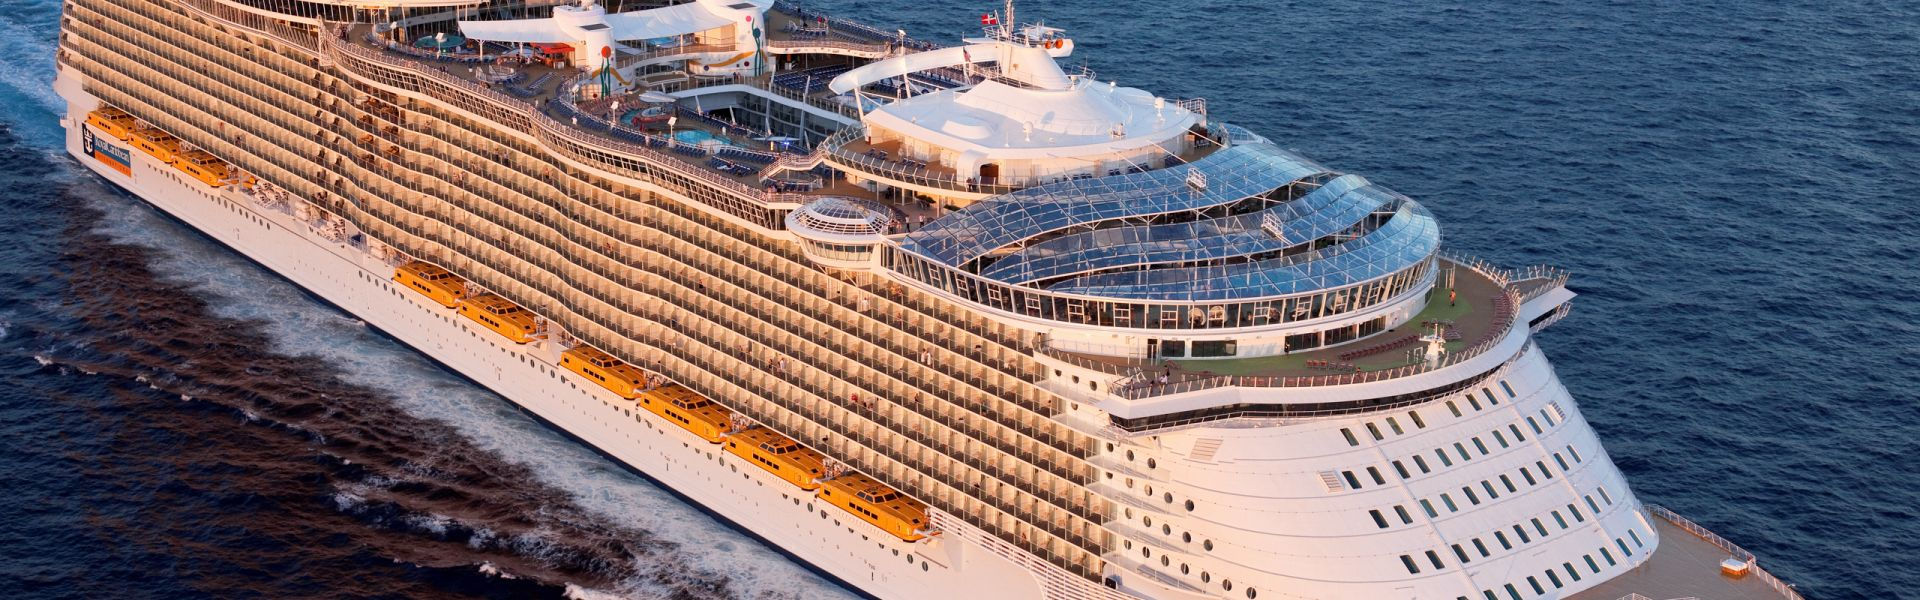 Croaziera 2017 - Caraibele de Vest (Fort Lauderdale) - Royal Caribbean Cruise Line - Allure of the Seas - 7 nopti